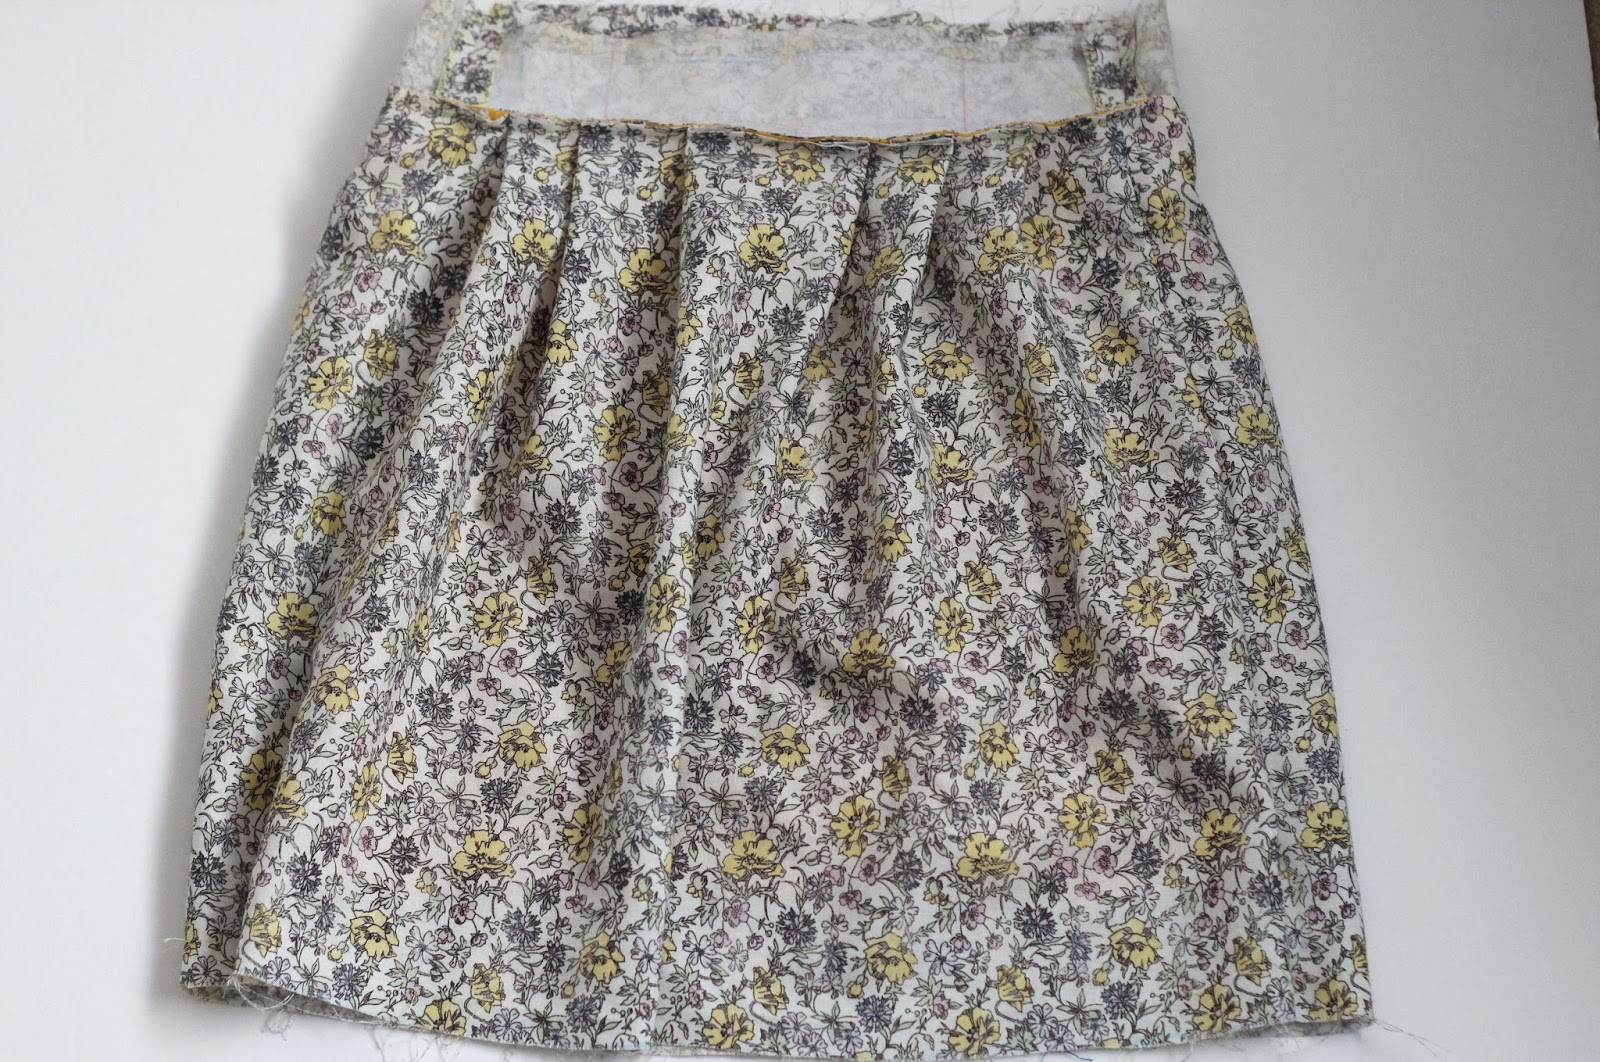 Skirt stitching iron interface in waistband pleated skirt